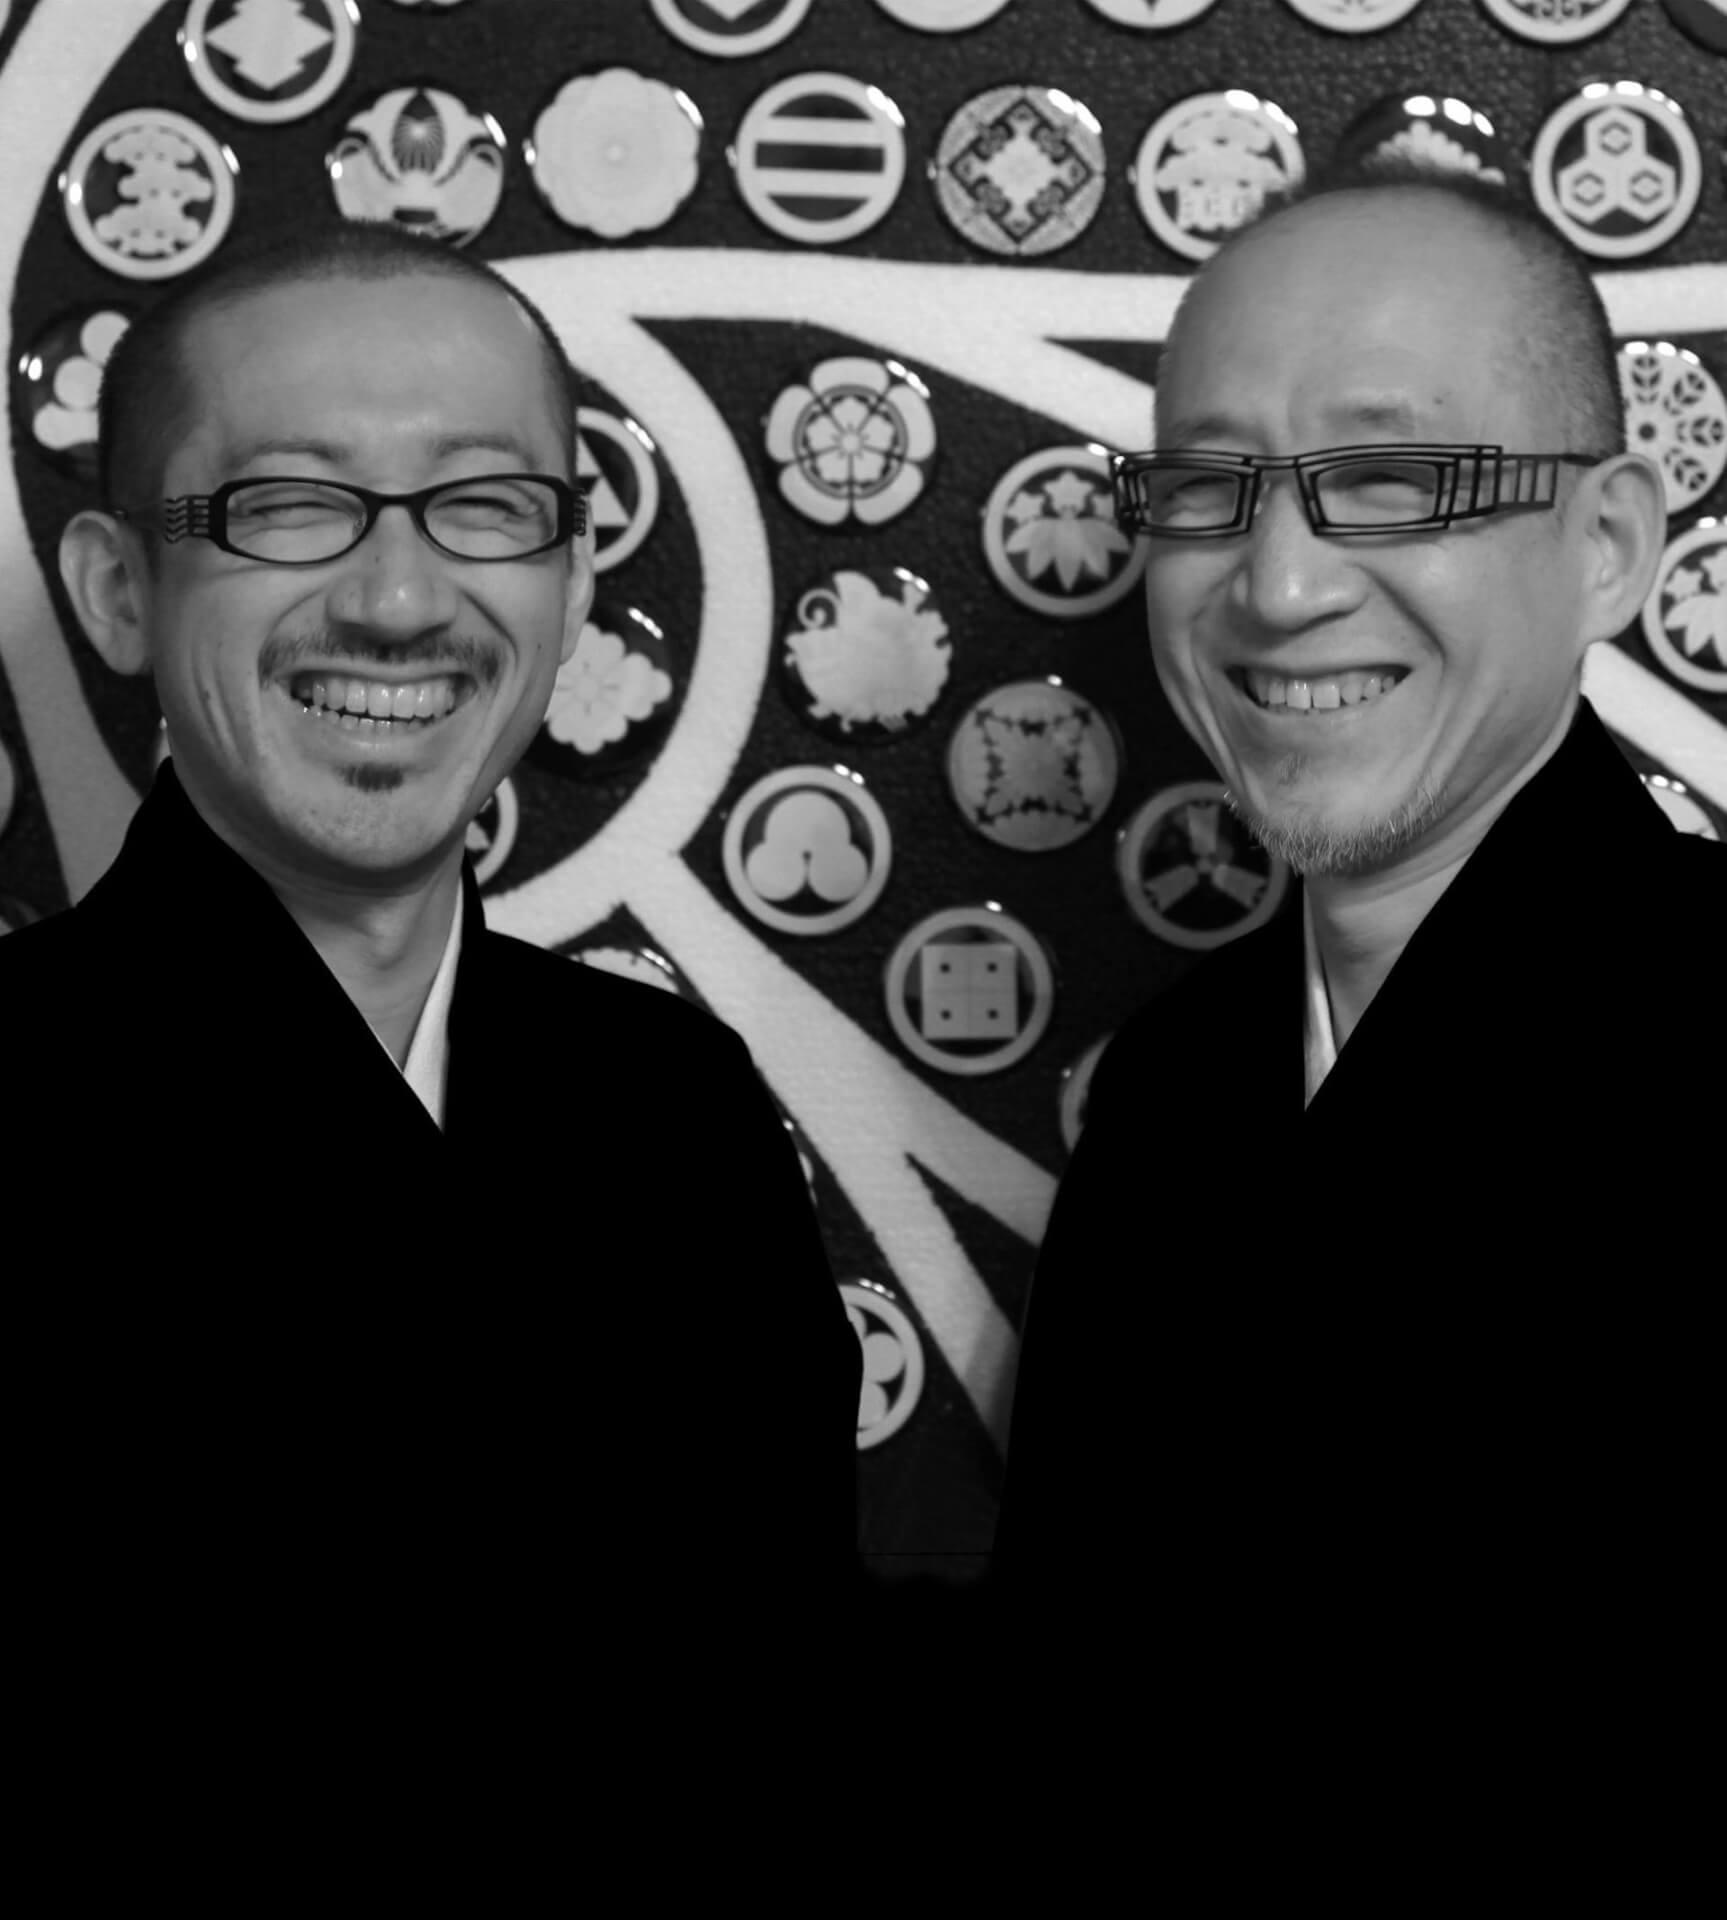 <Japan Media Arts Distributed Museum ETERNAL ~千秒の清寂>が羽田空港国際線ターミナルで開催!KyokaやTETSUJI OHNOらも作品に参加 ac200127_eternal_13